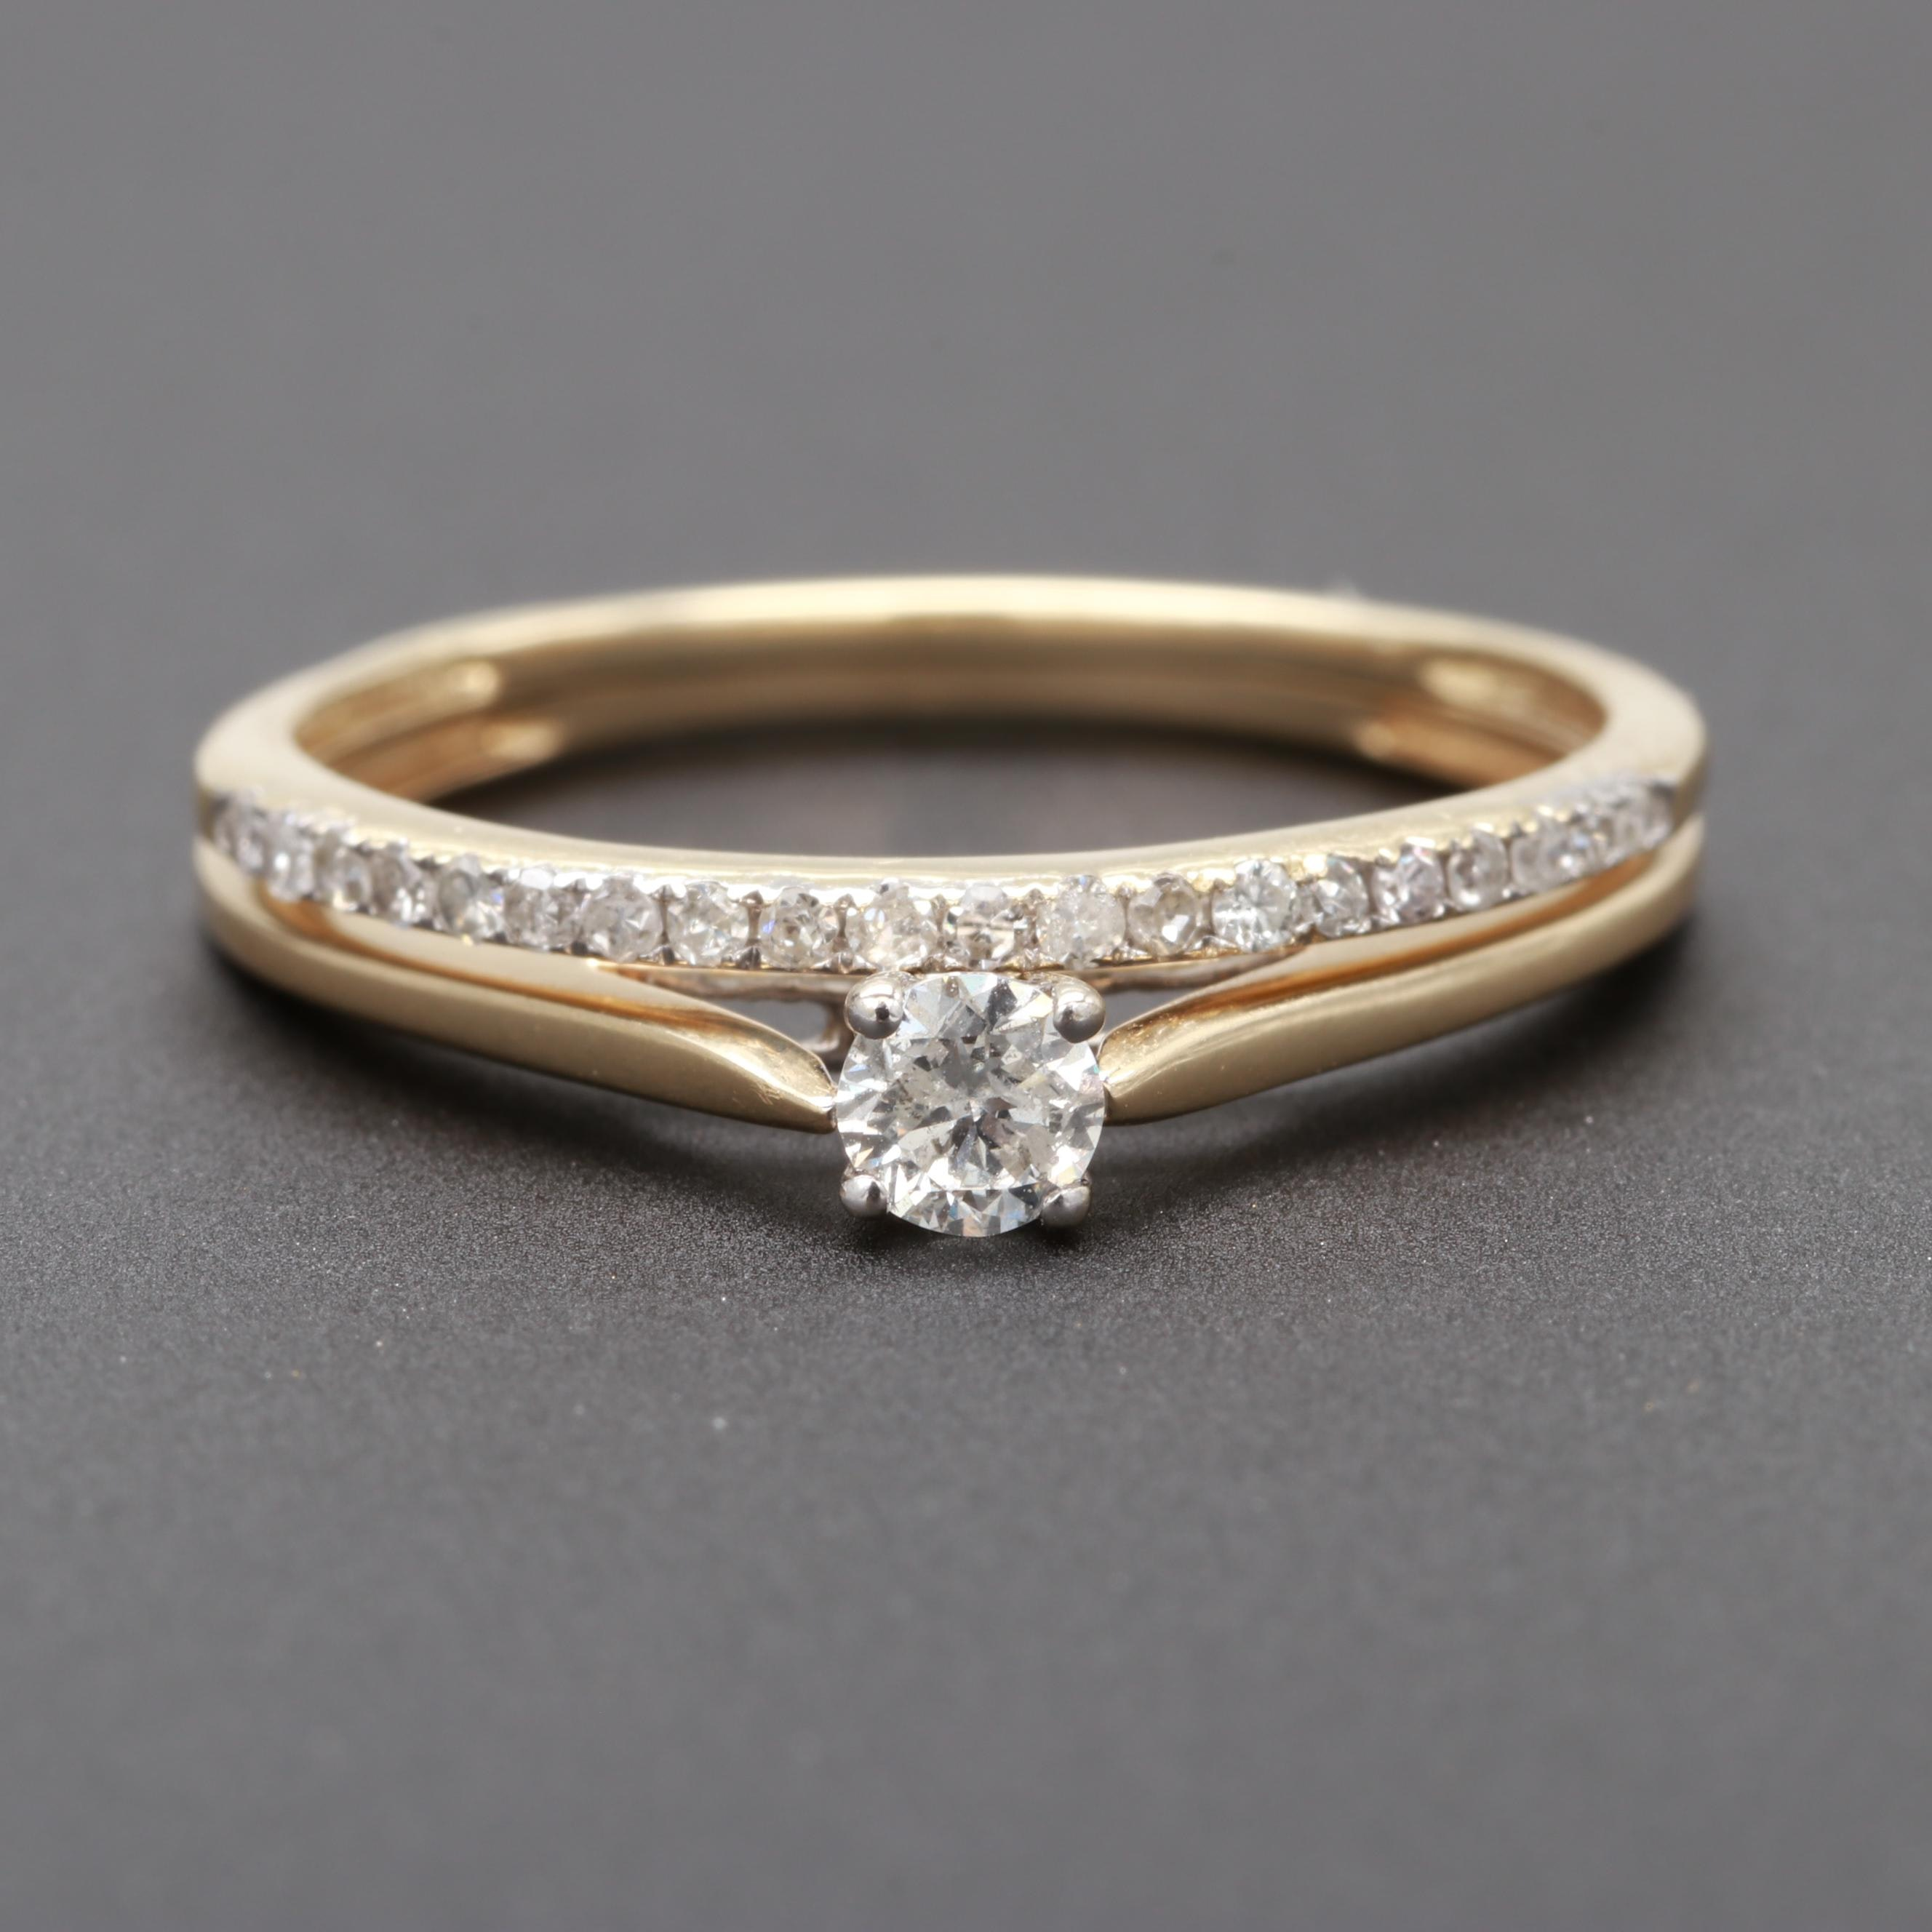 14K and 10K Yellow Gold Diamond Ring Set